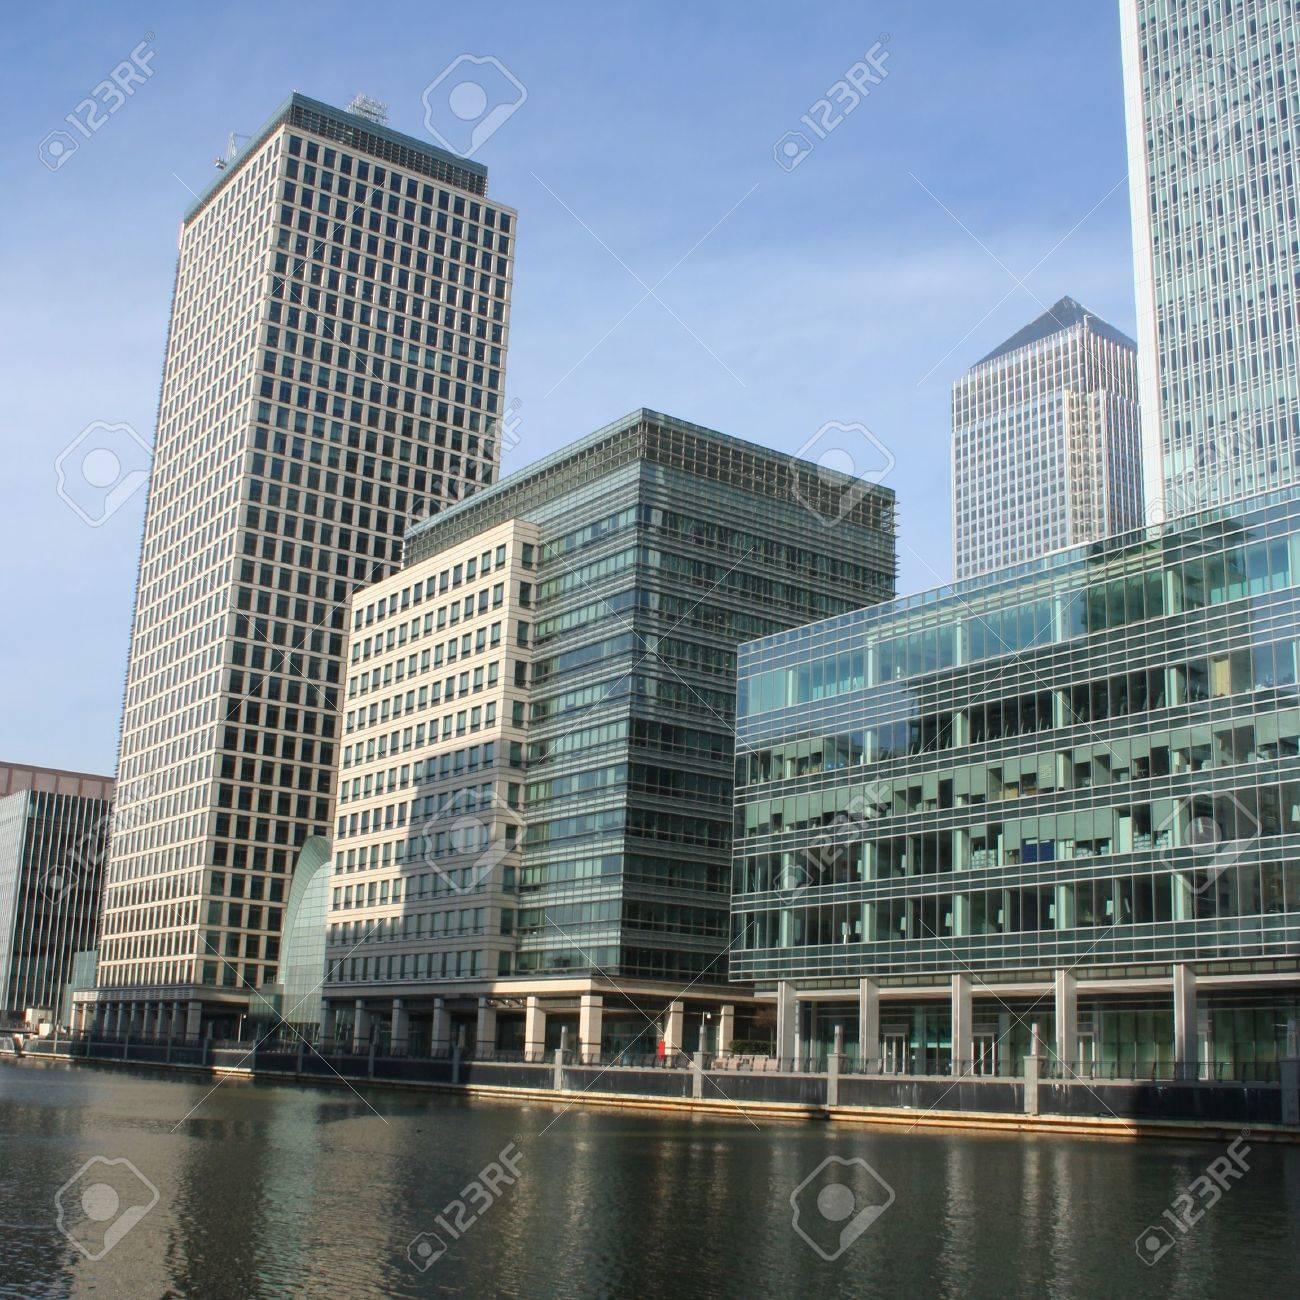 Modern Architecture London England interesting modern architecture london england uk city hall in ideas